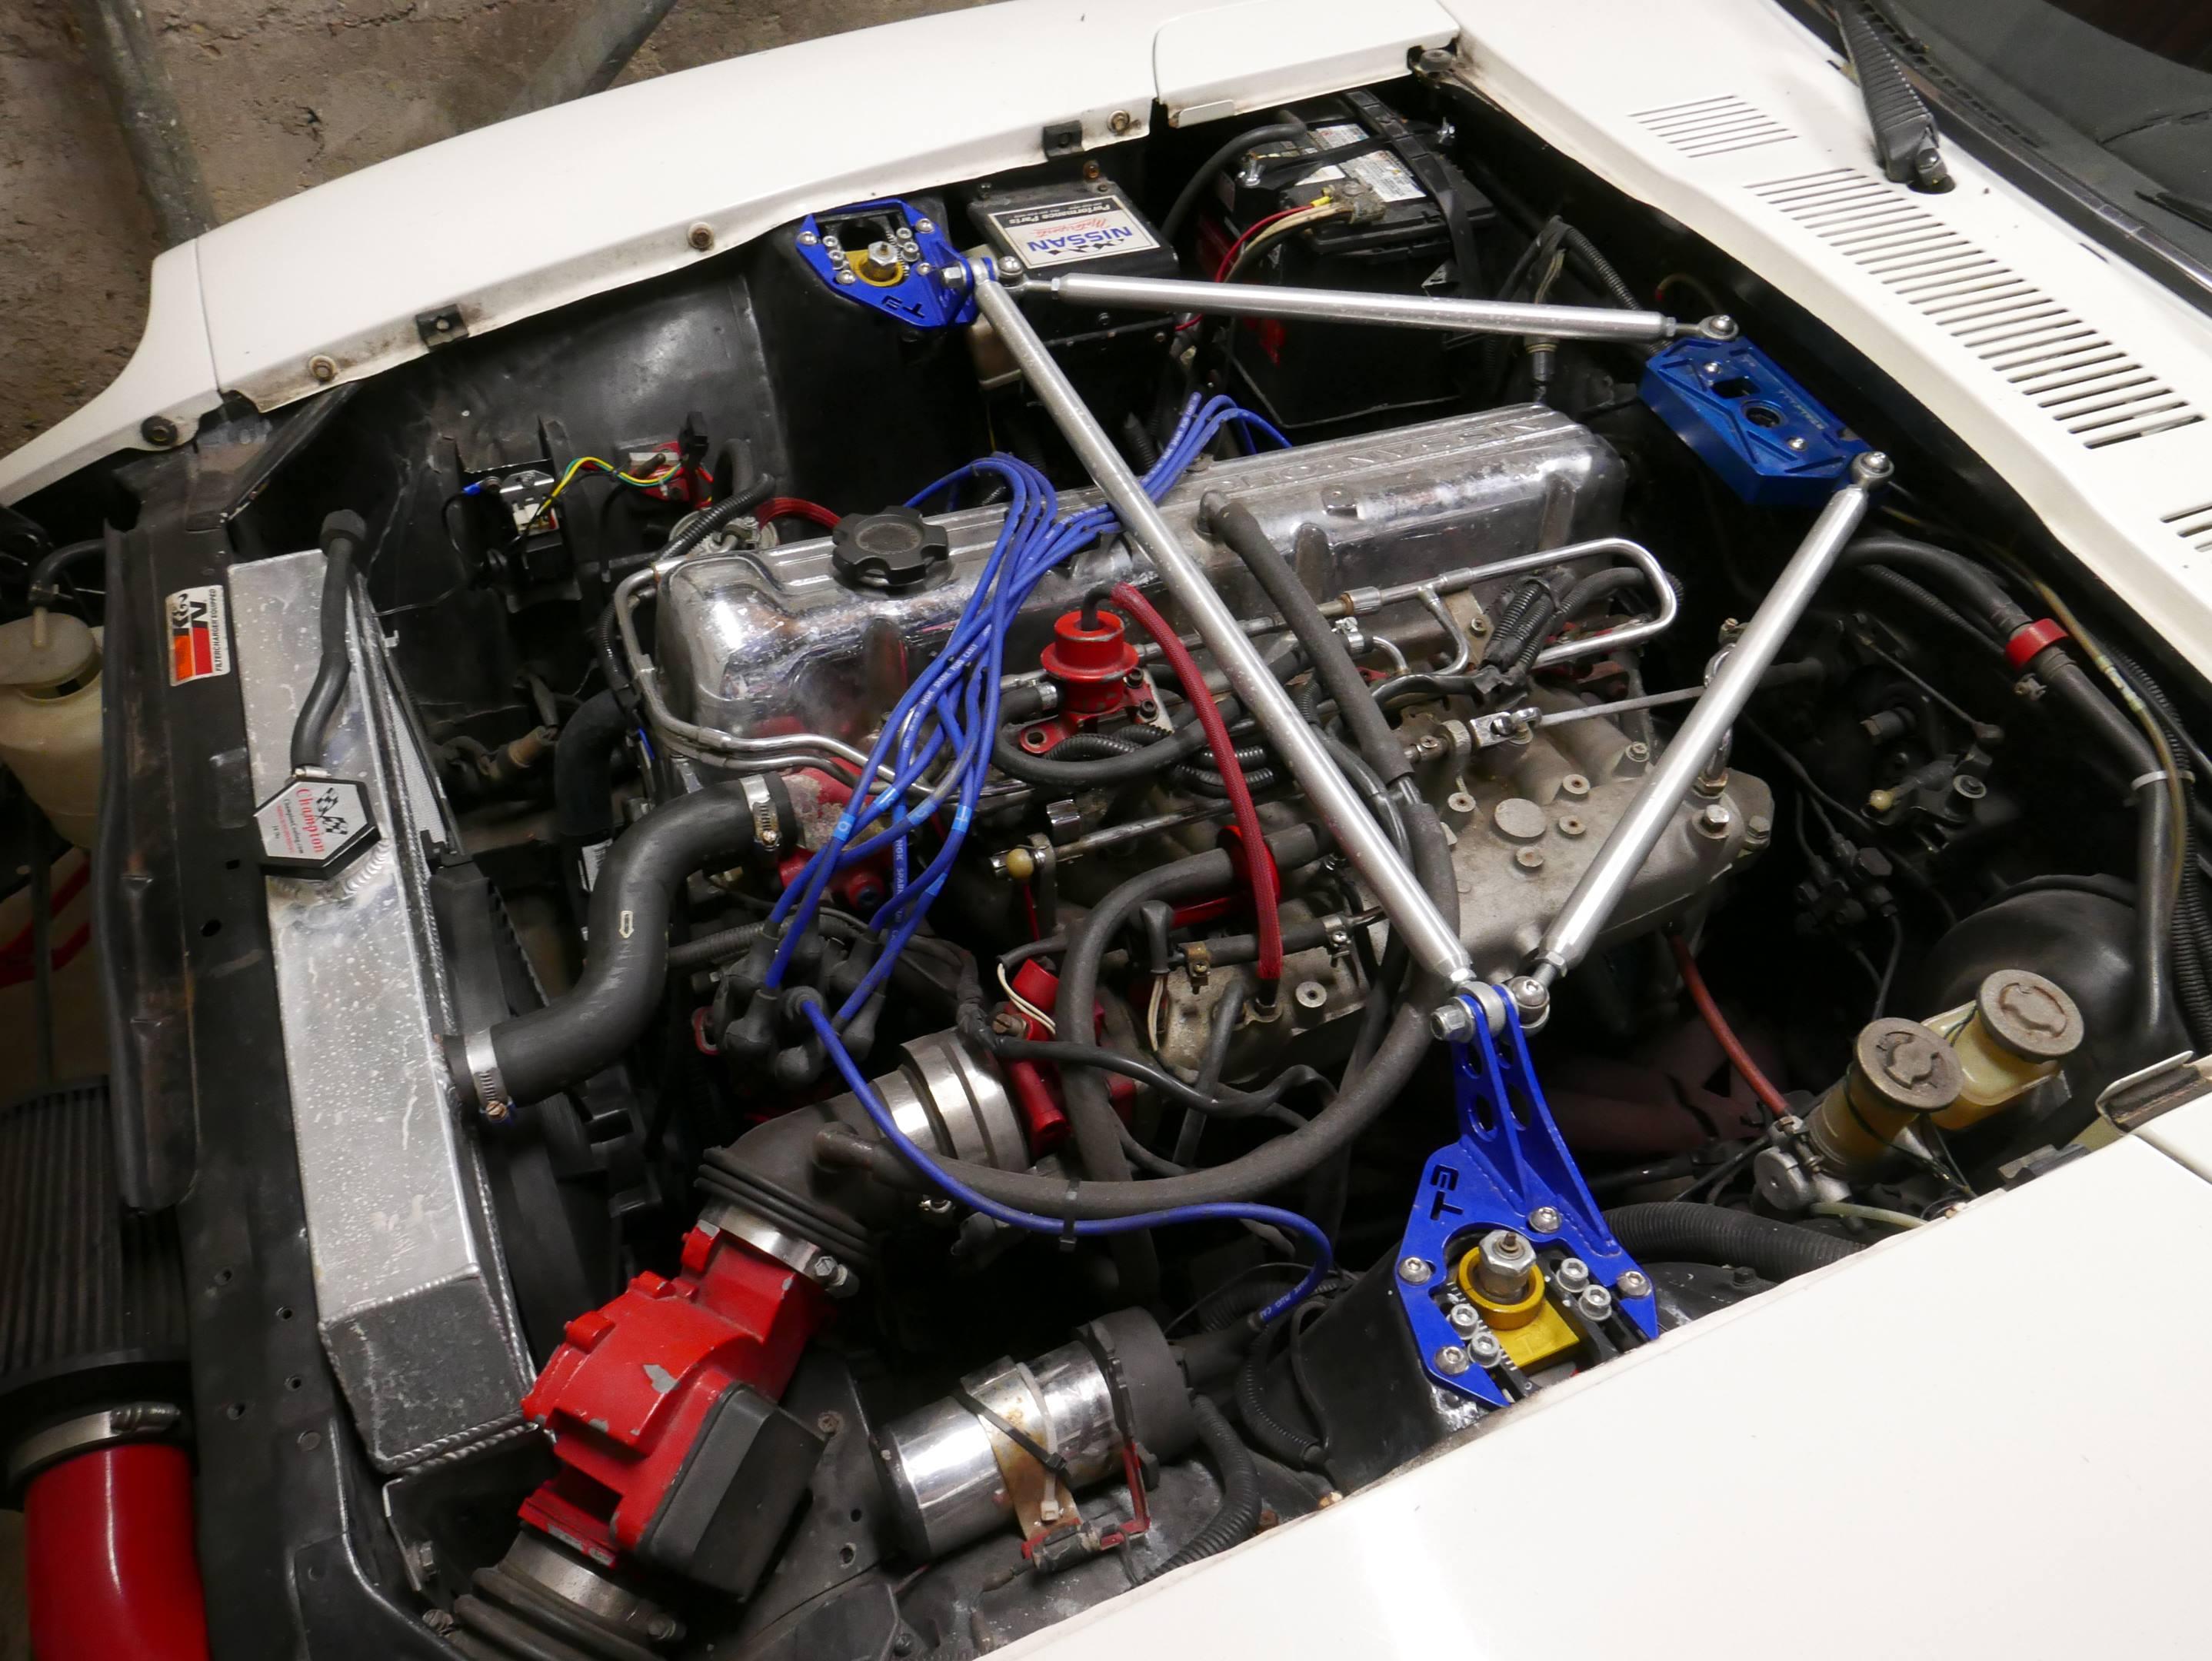 1978 Datsun 280Z engine